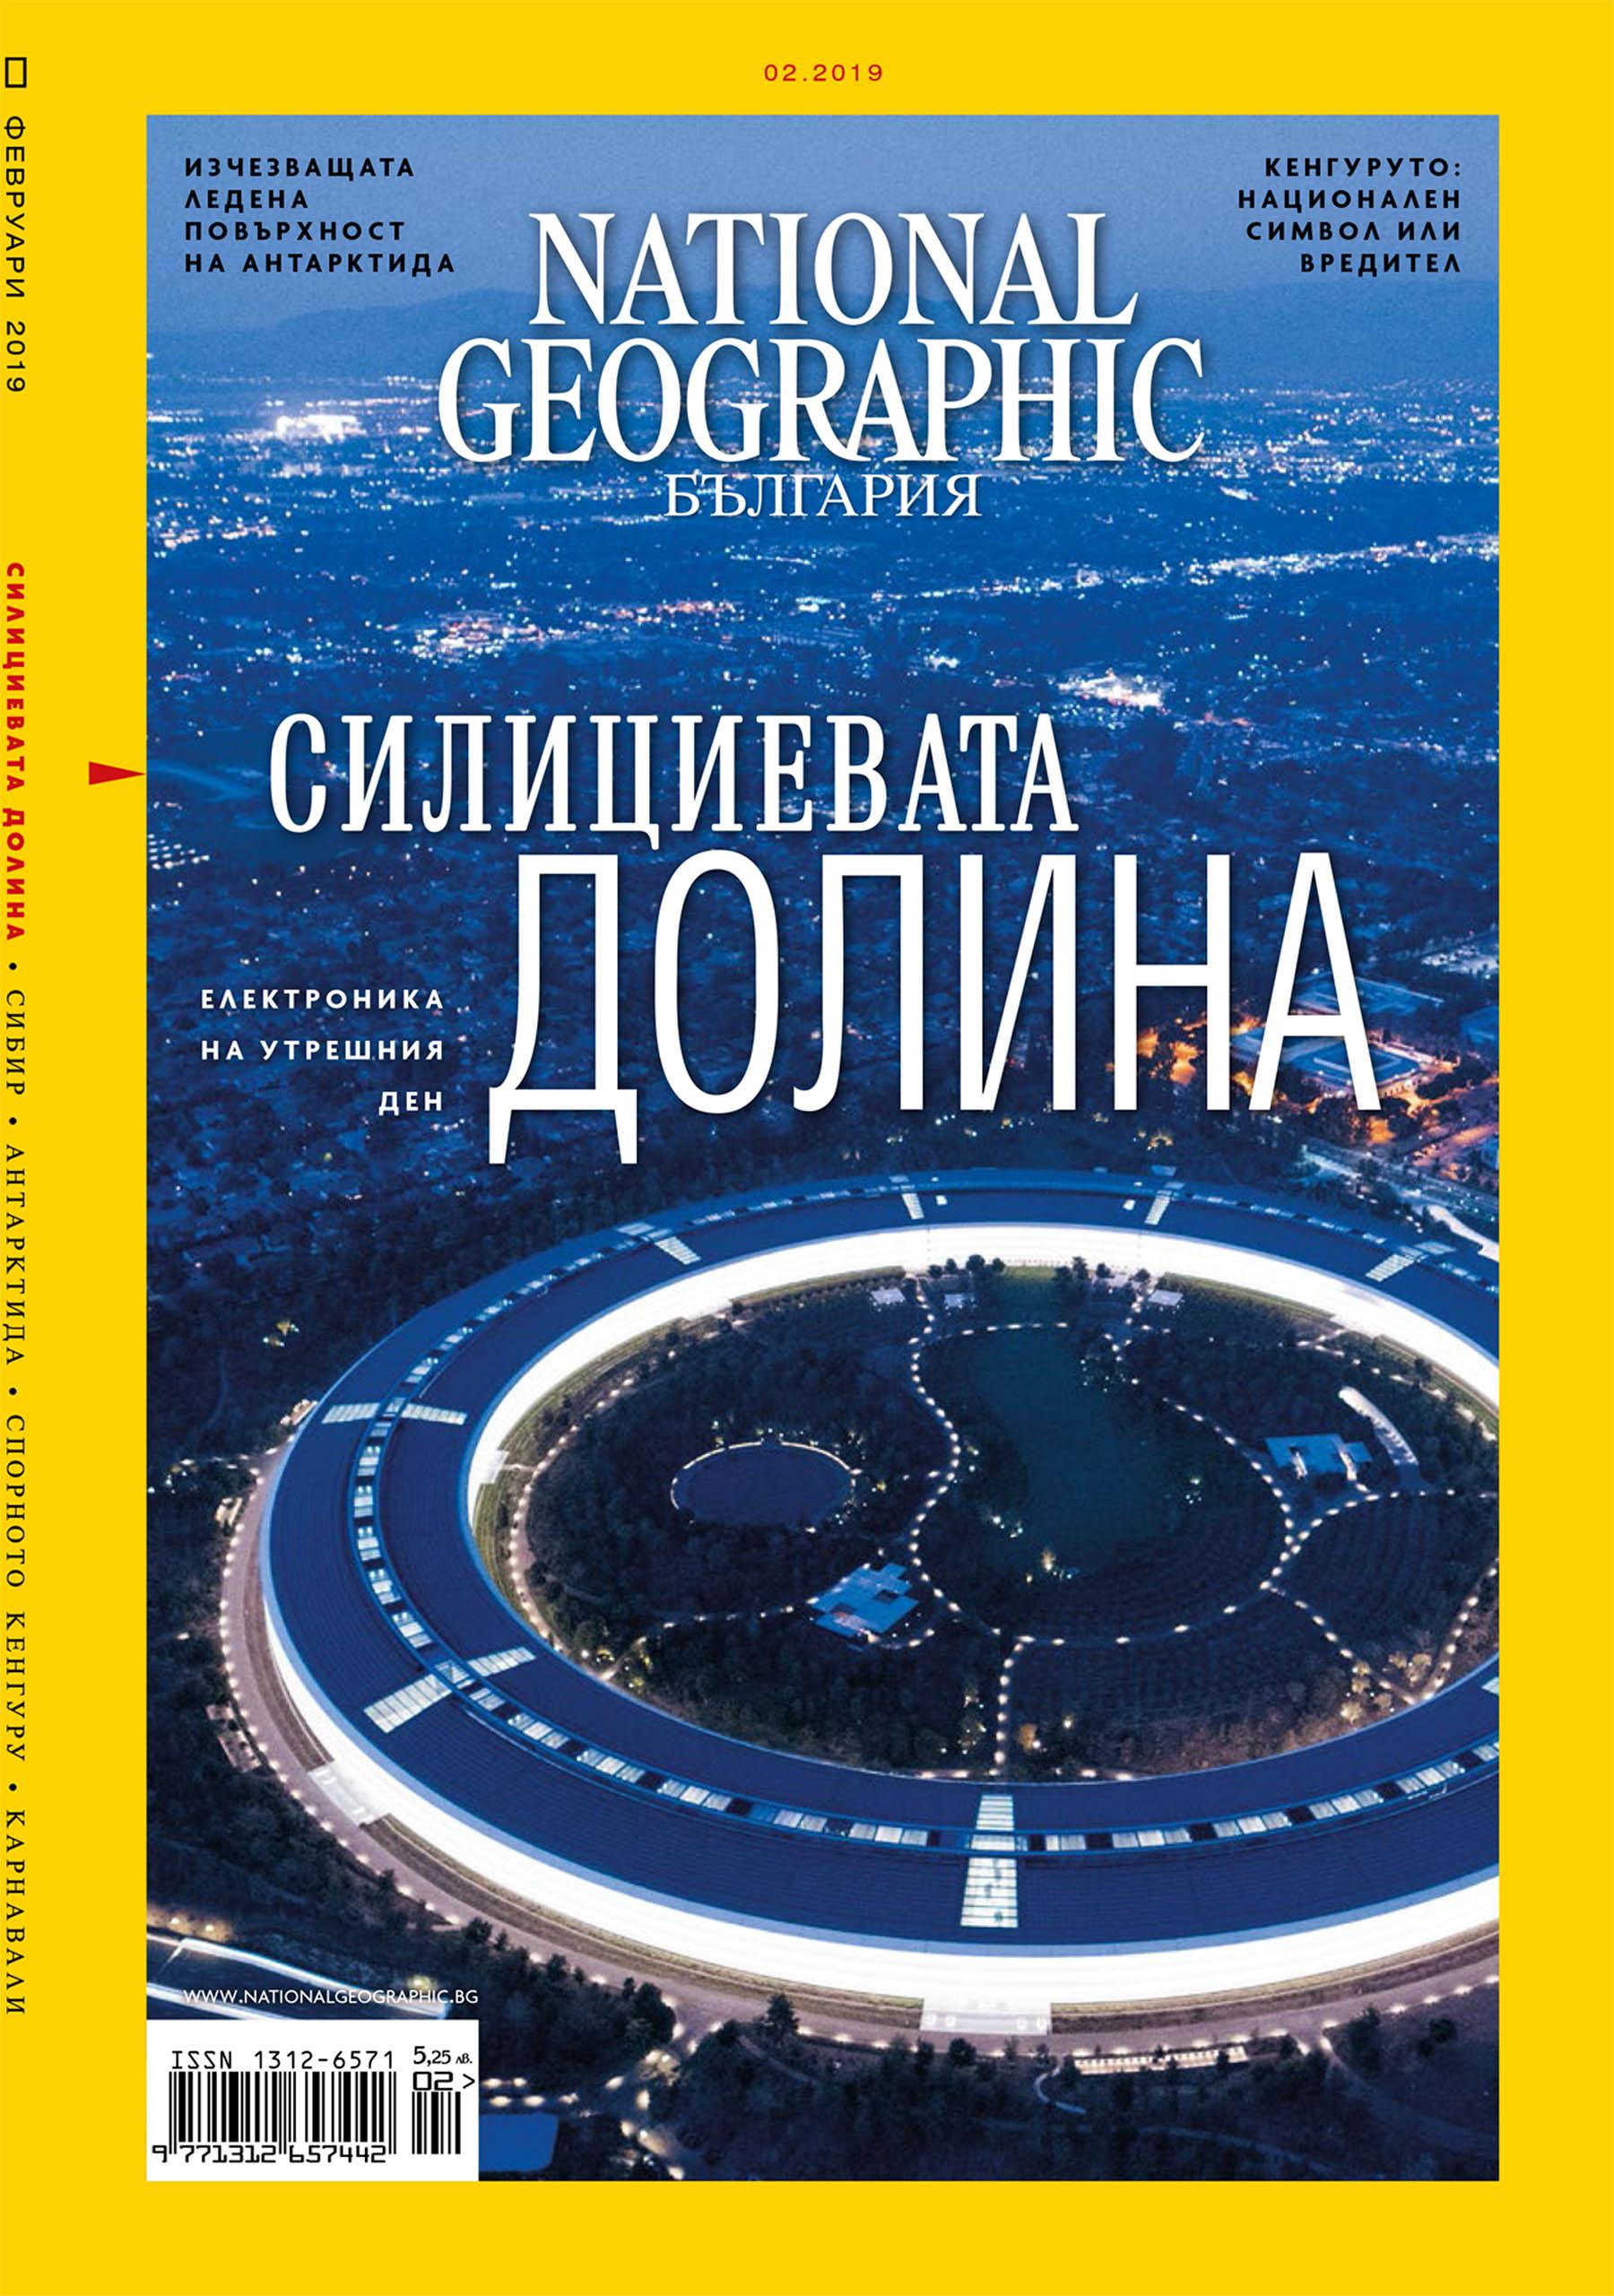 Bulgaria_BG 0219_Silicon Valley cover.jpg